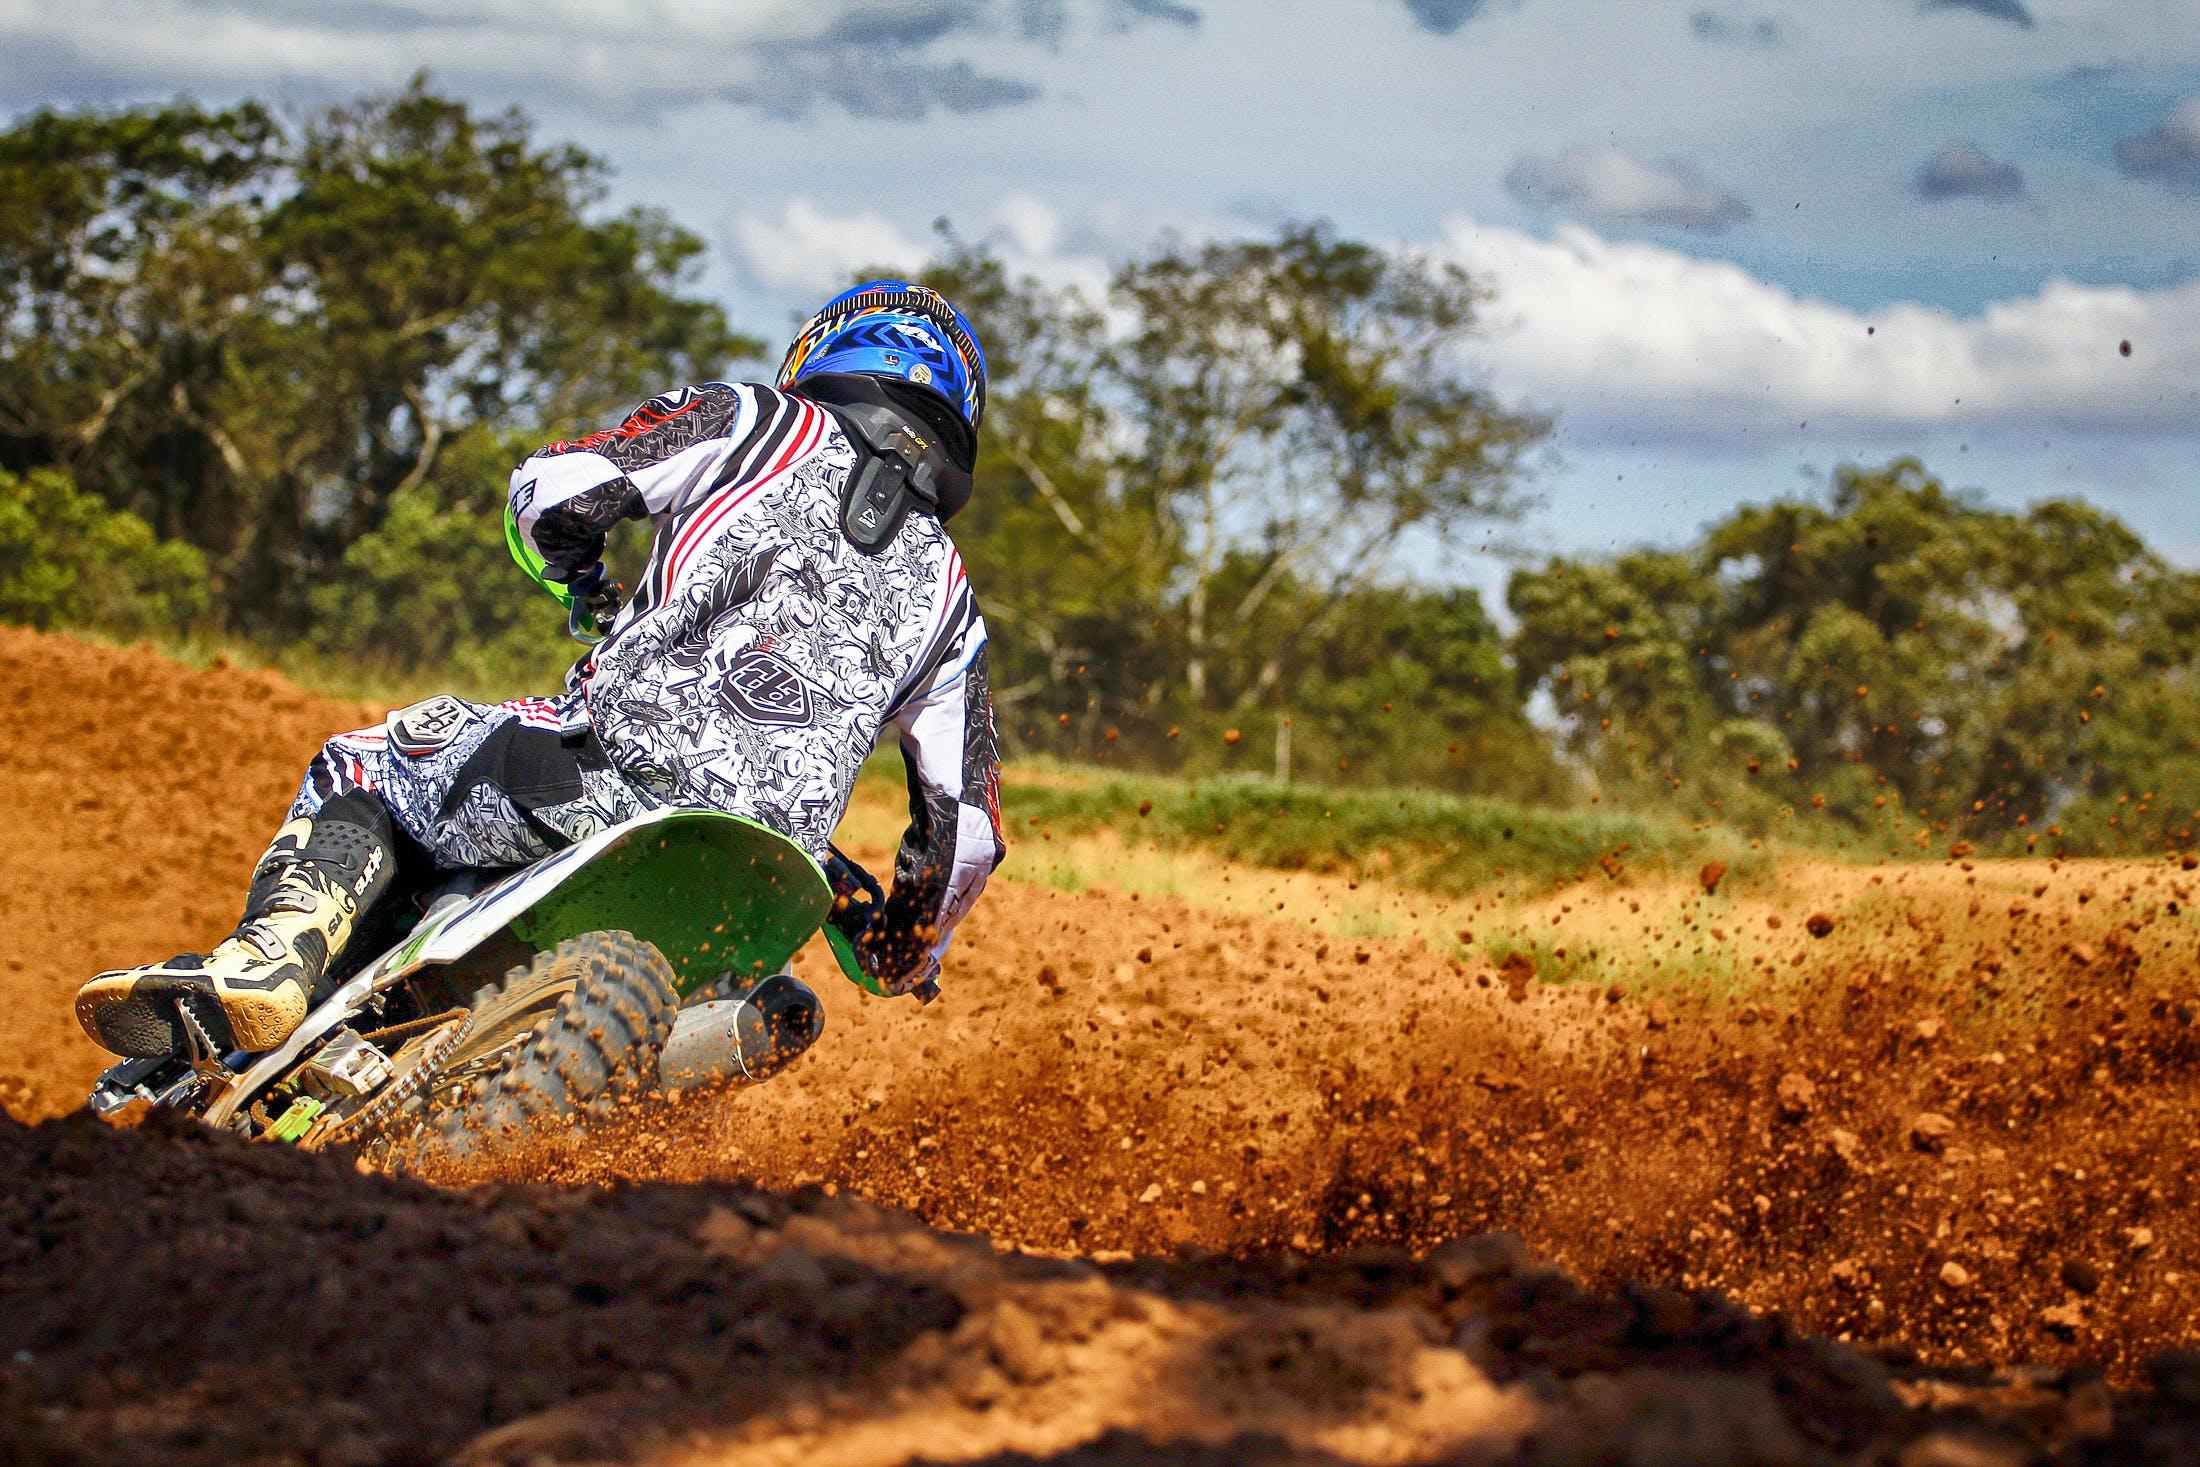 Man Riding Motocross Dirt Bike on Track